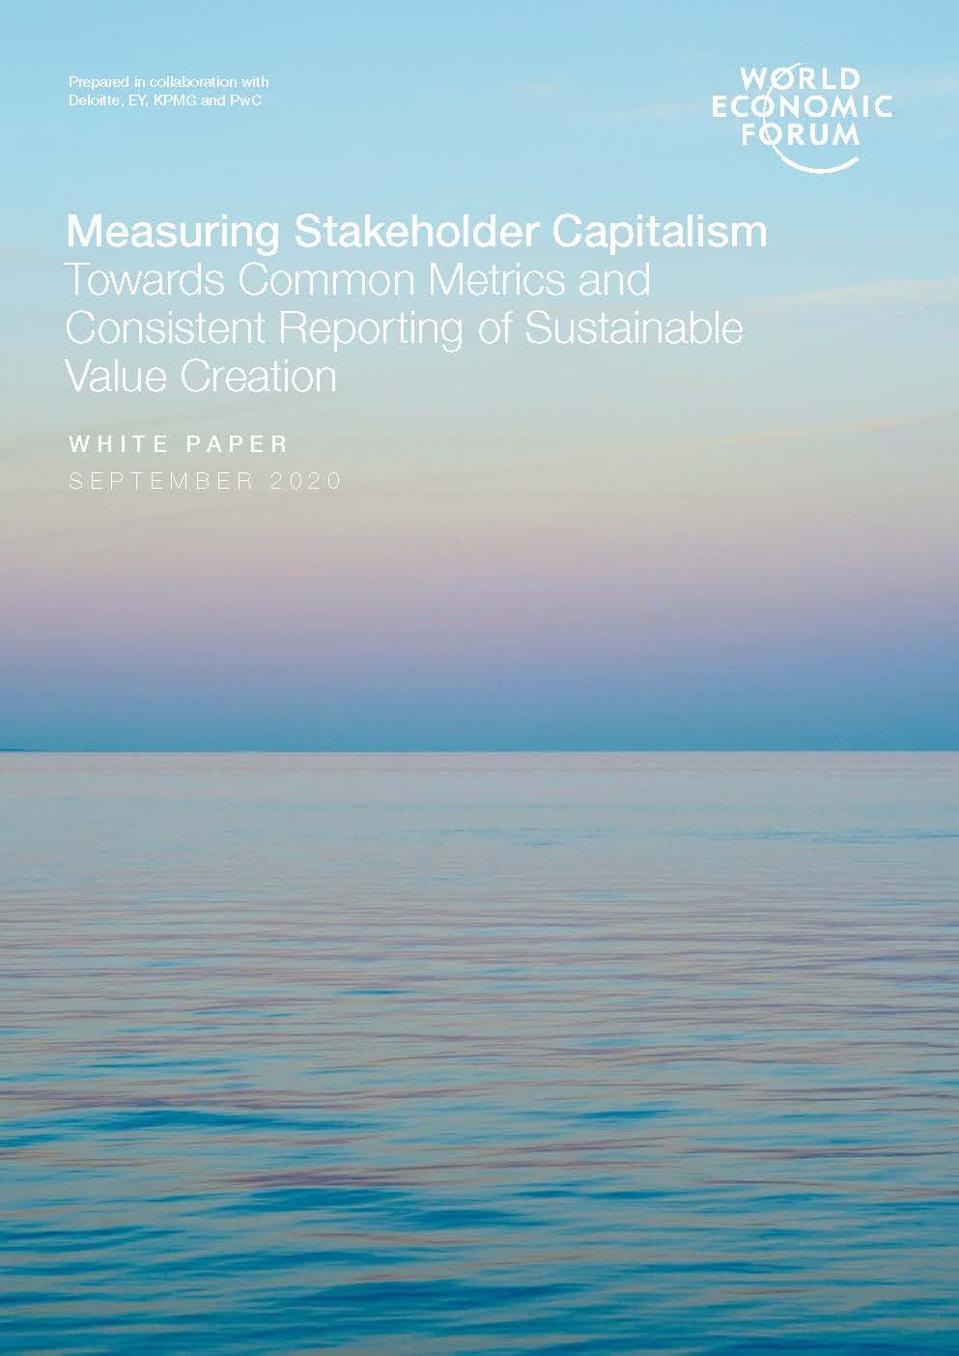 Measuring Stakeholder Capitalism White Paper